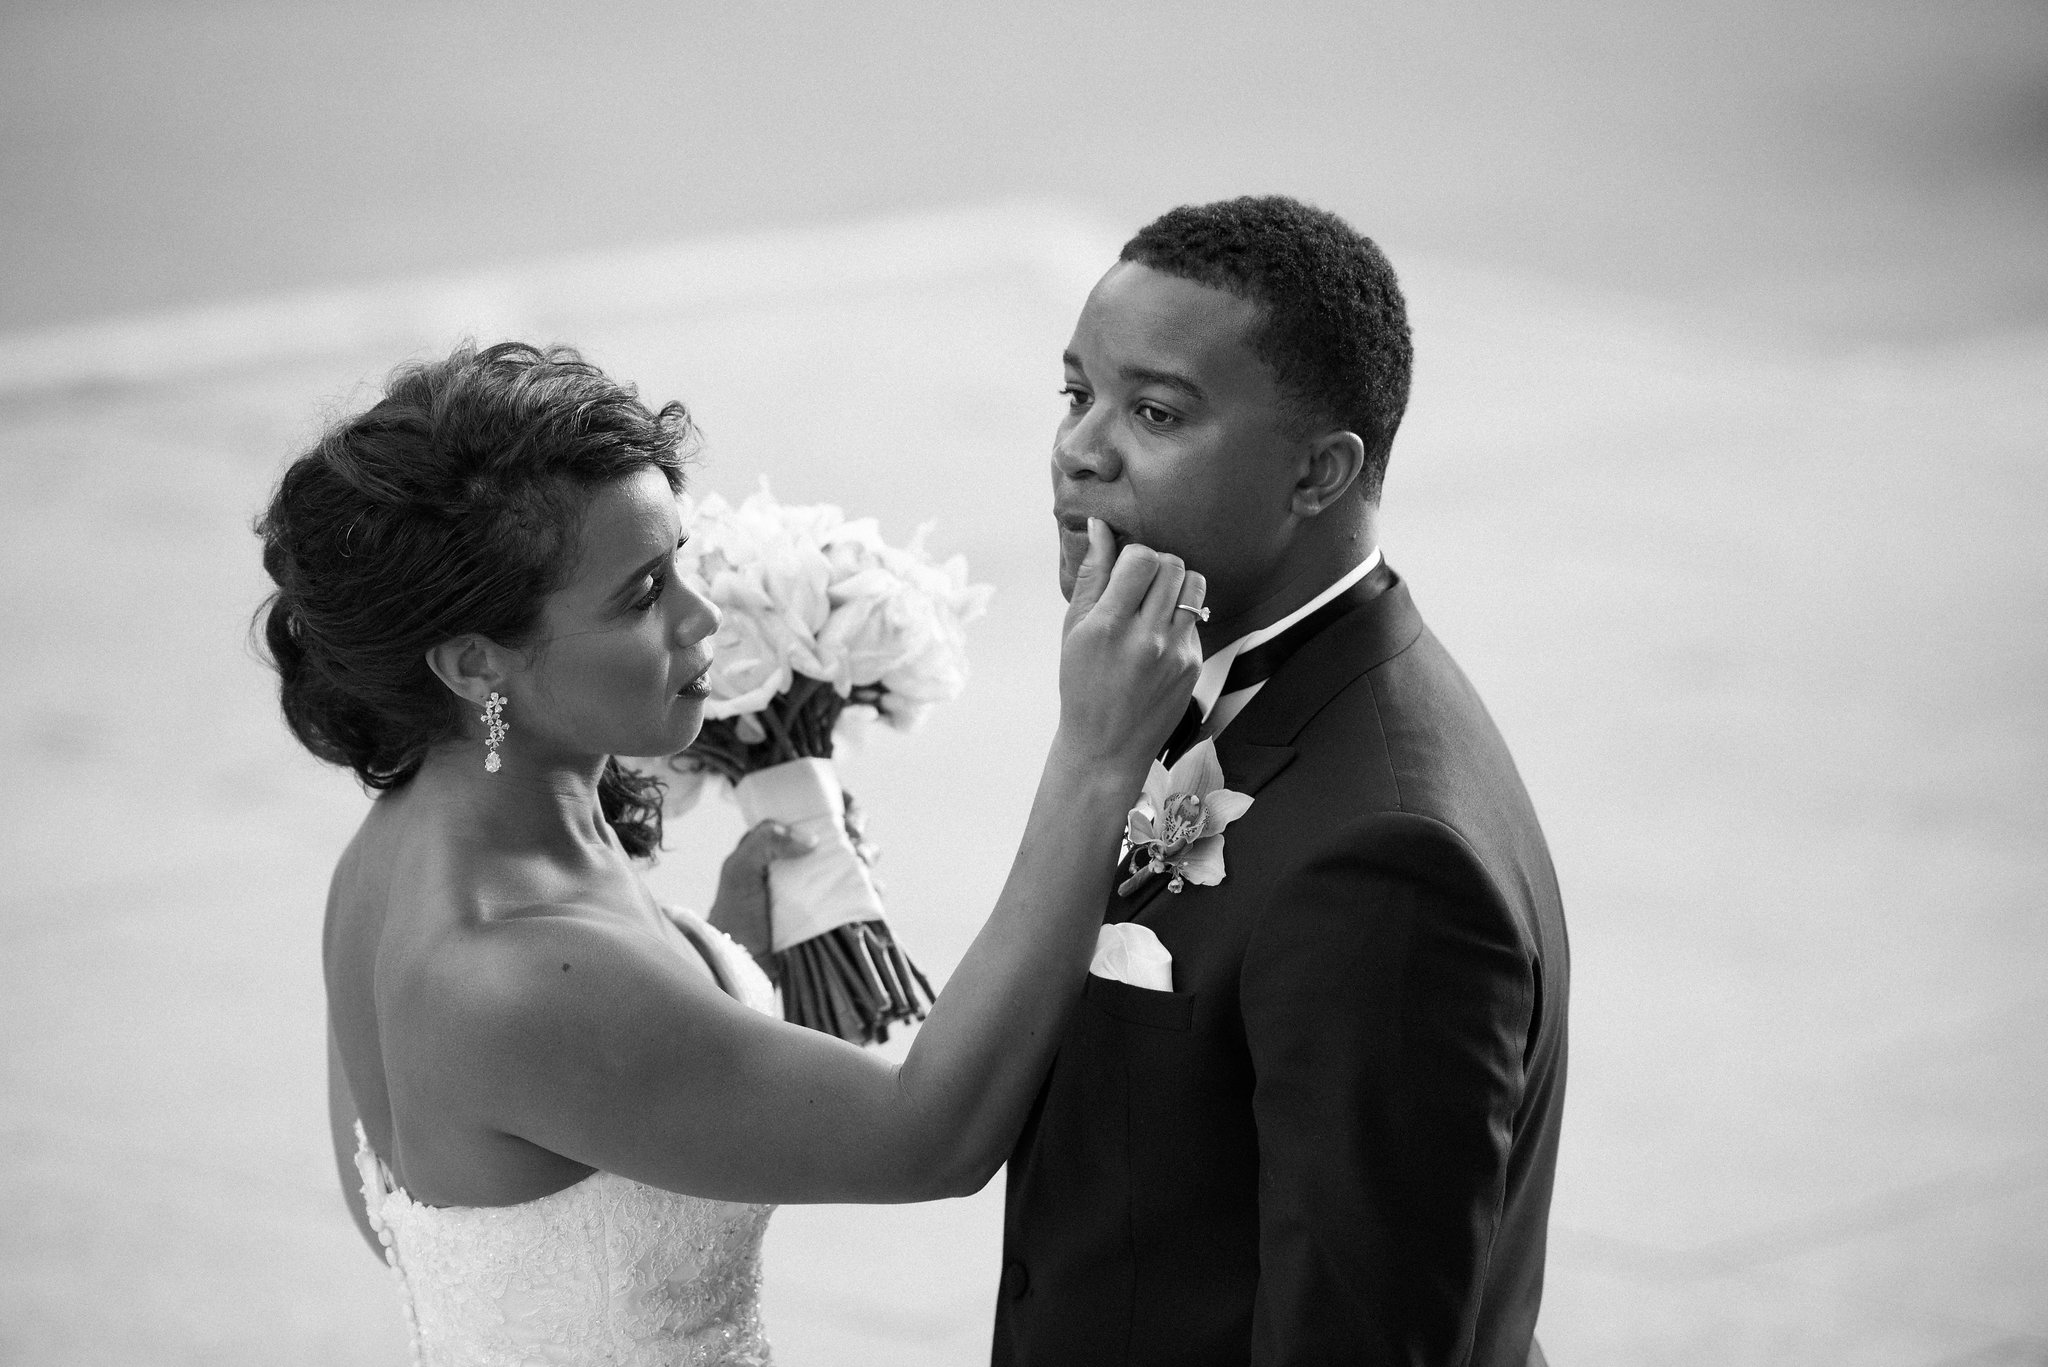 st-augustine-wedding-photographer-sarah-annay-photographer-1.jpg